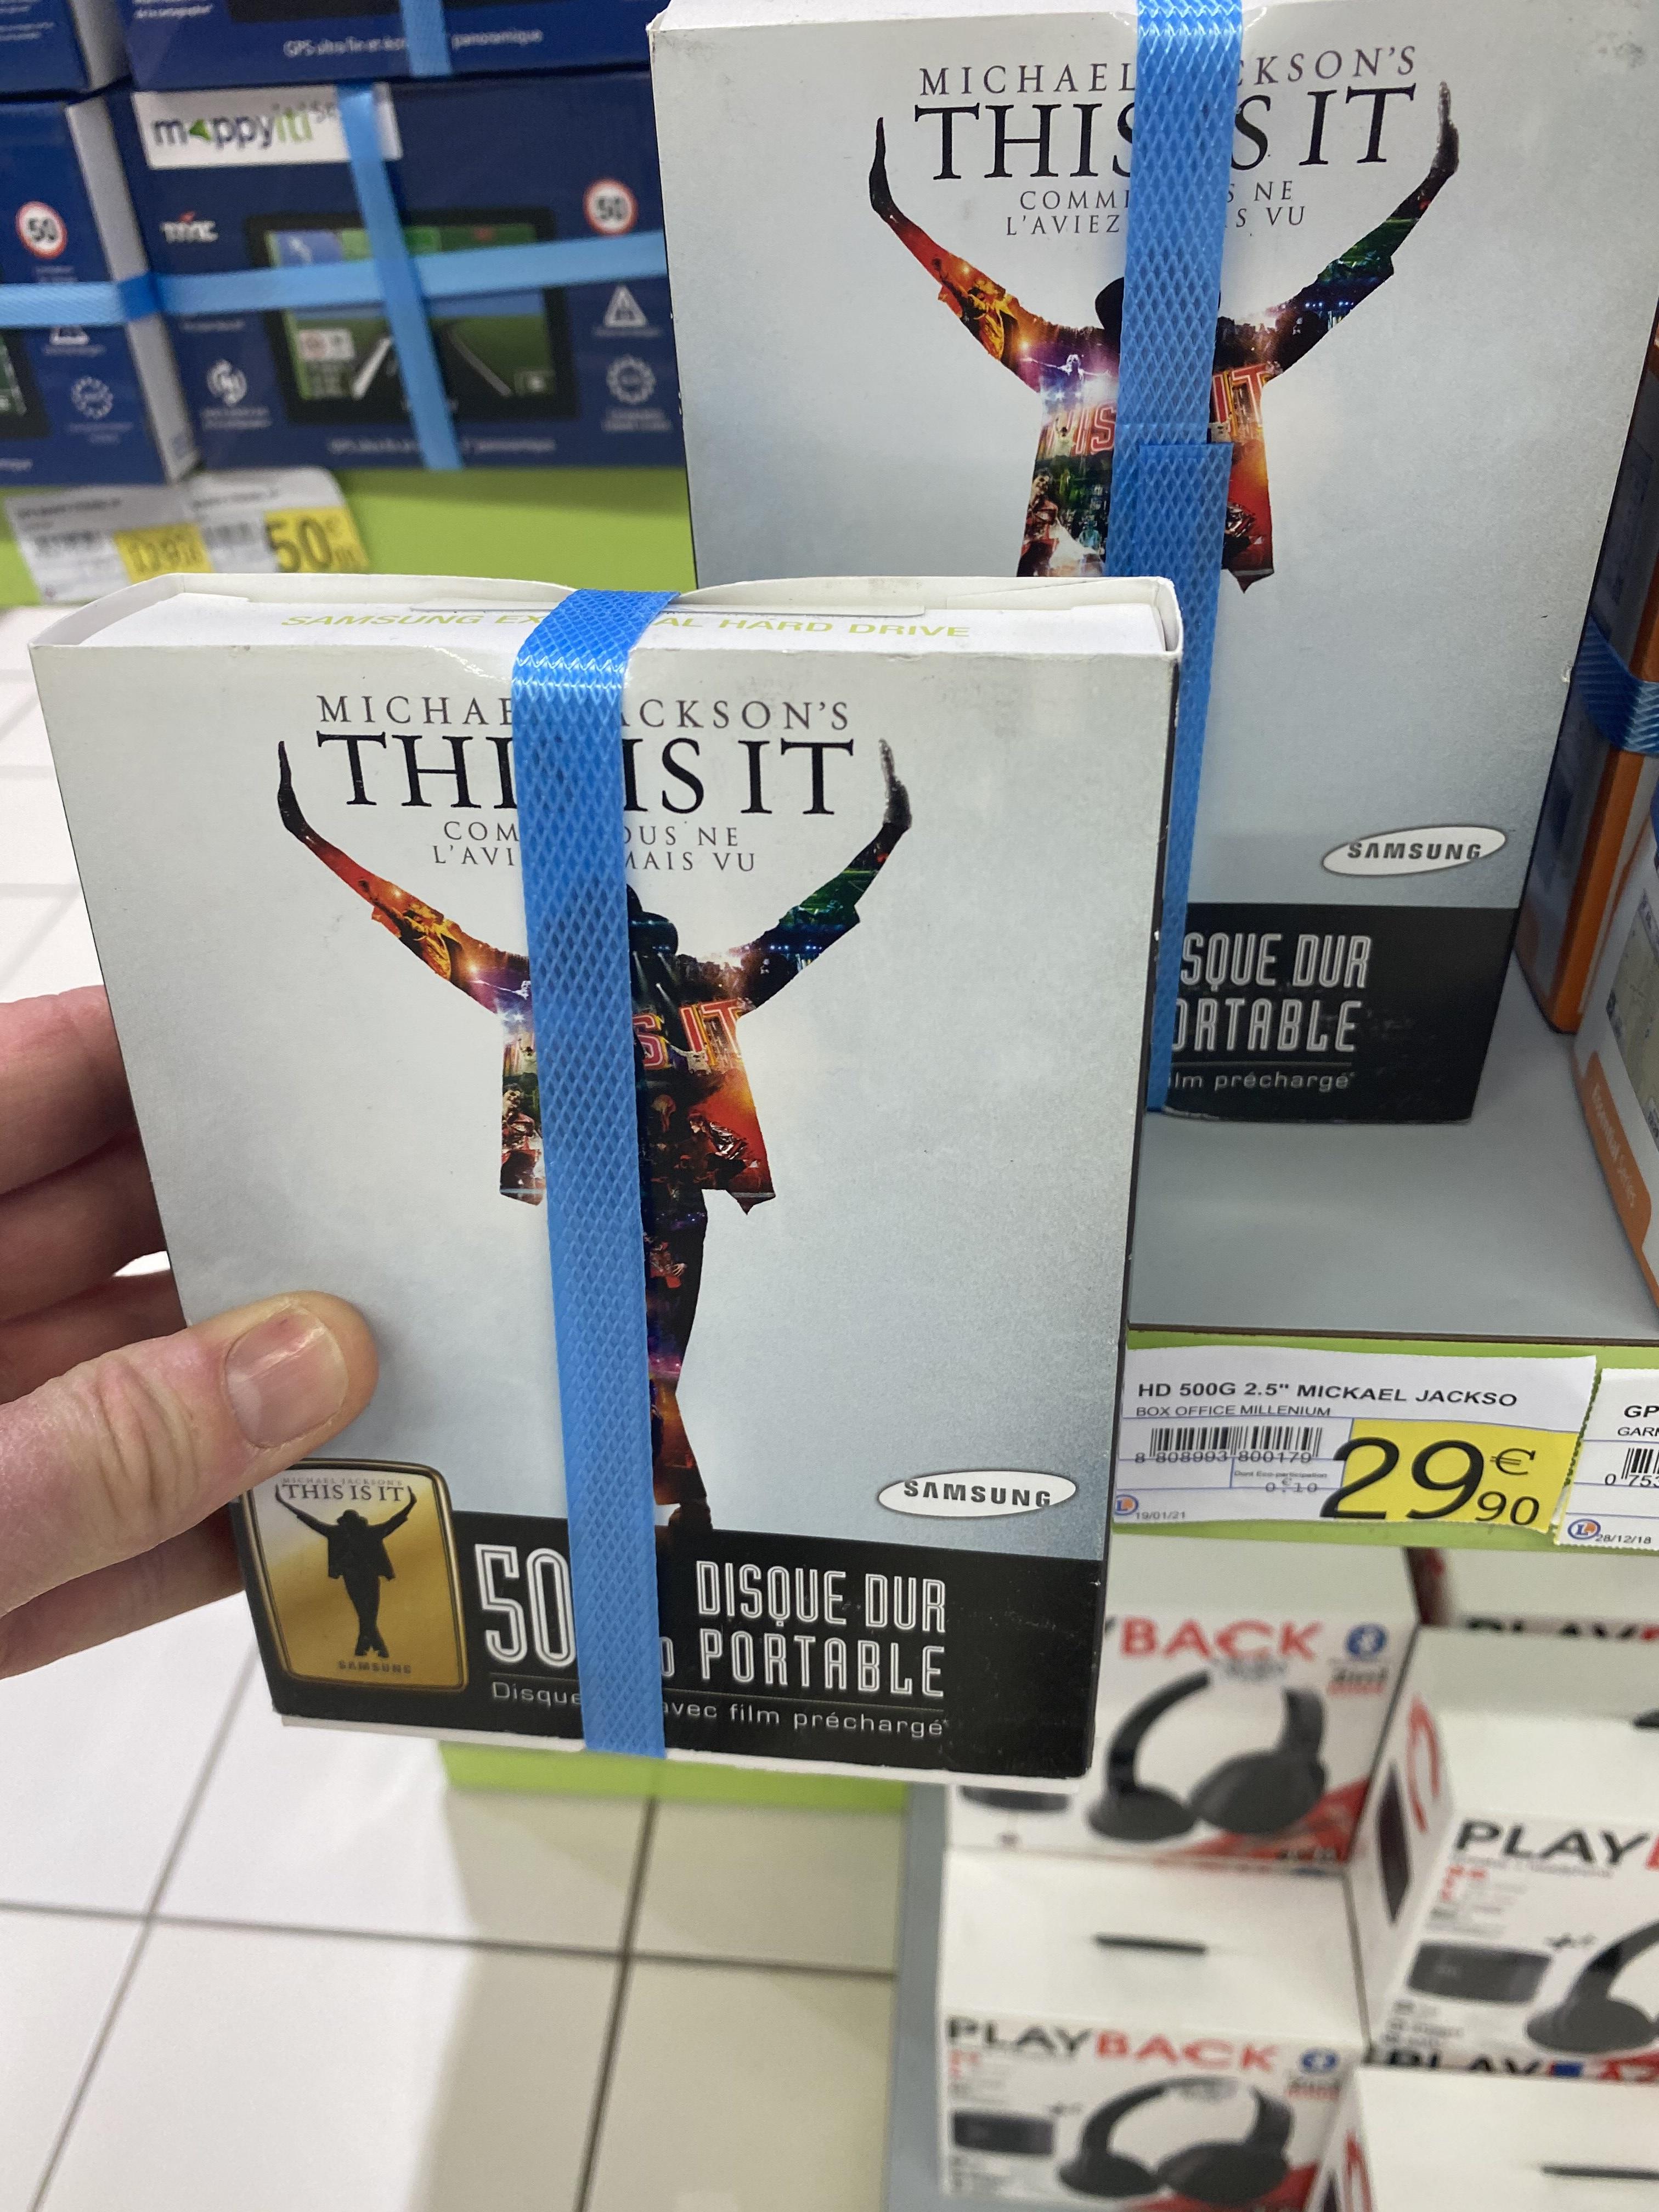 Disque dur externe Samsung S2 Portable Édition Michael Jackson (500 Go) - Osny (95)